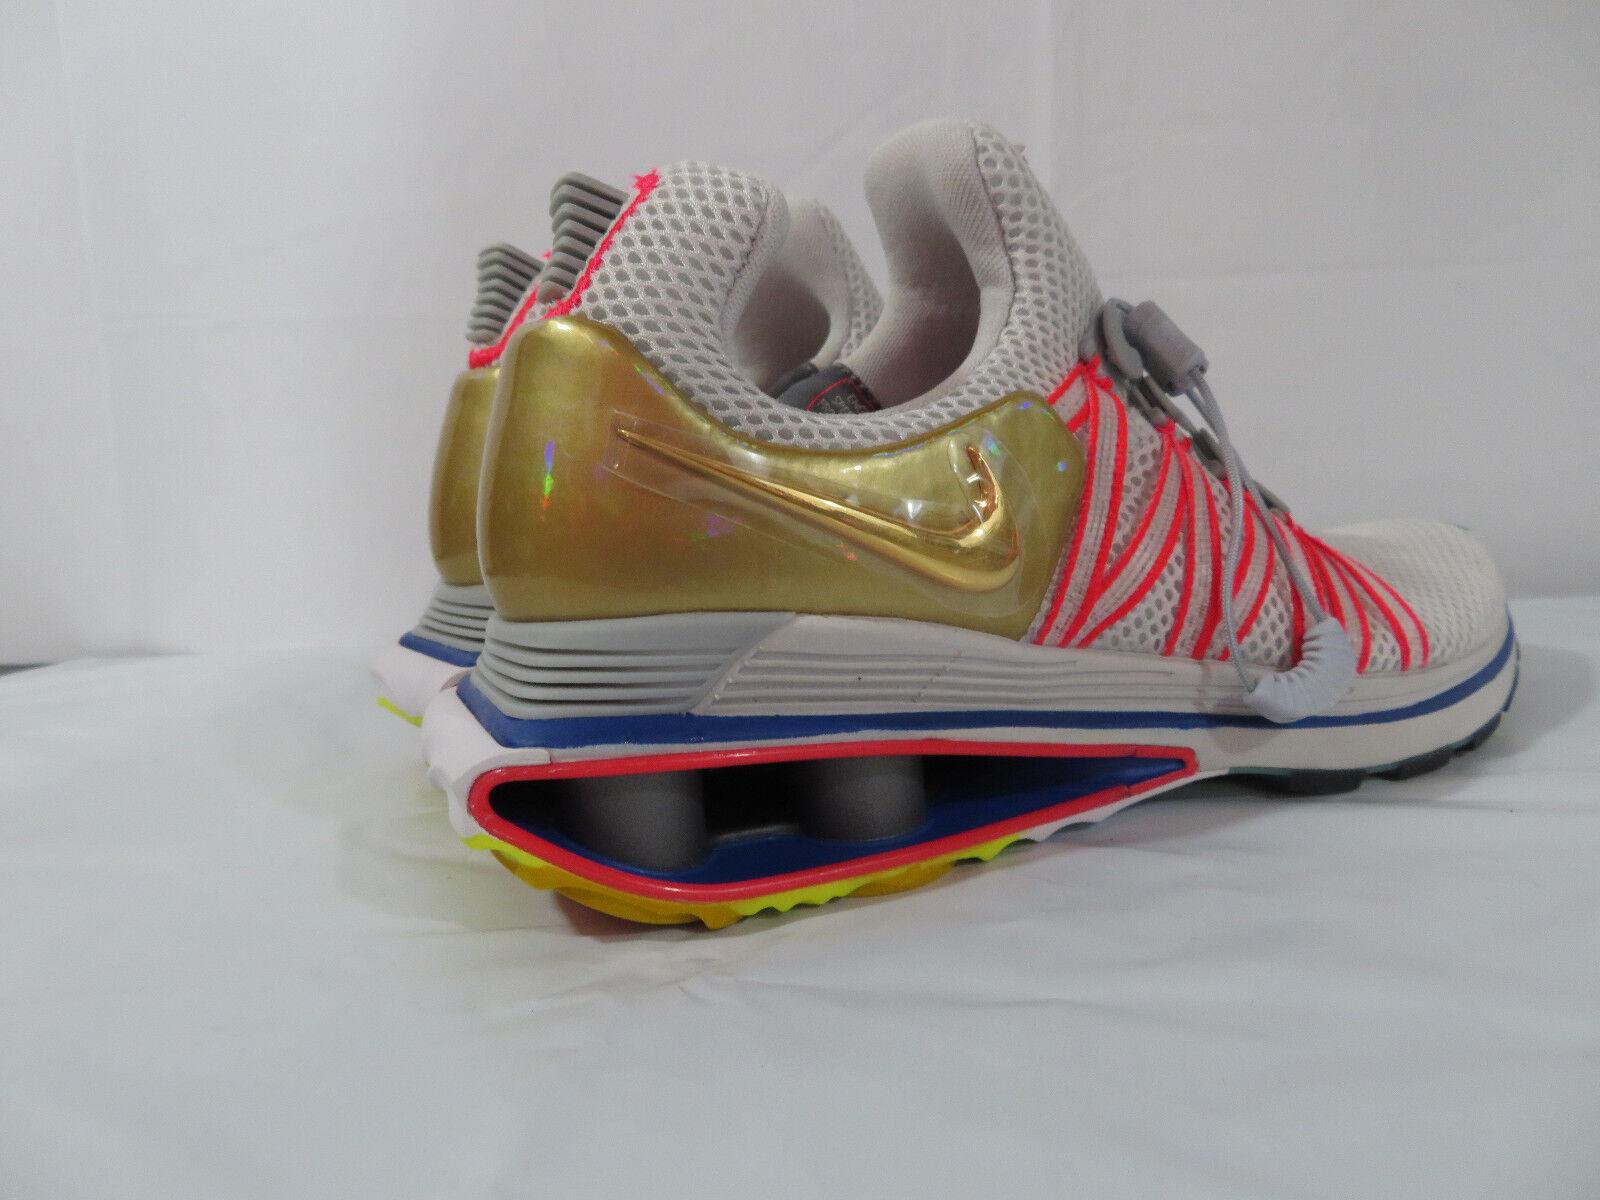 New Nike Shox Gravity Mens Olympic shoes Sizes Sizes Sizes Vast Grey Metallic gold AQ8553 009 14a09b